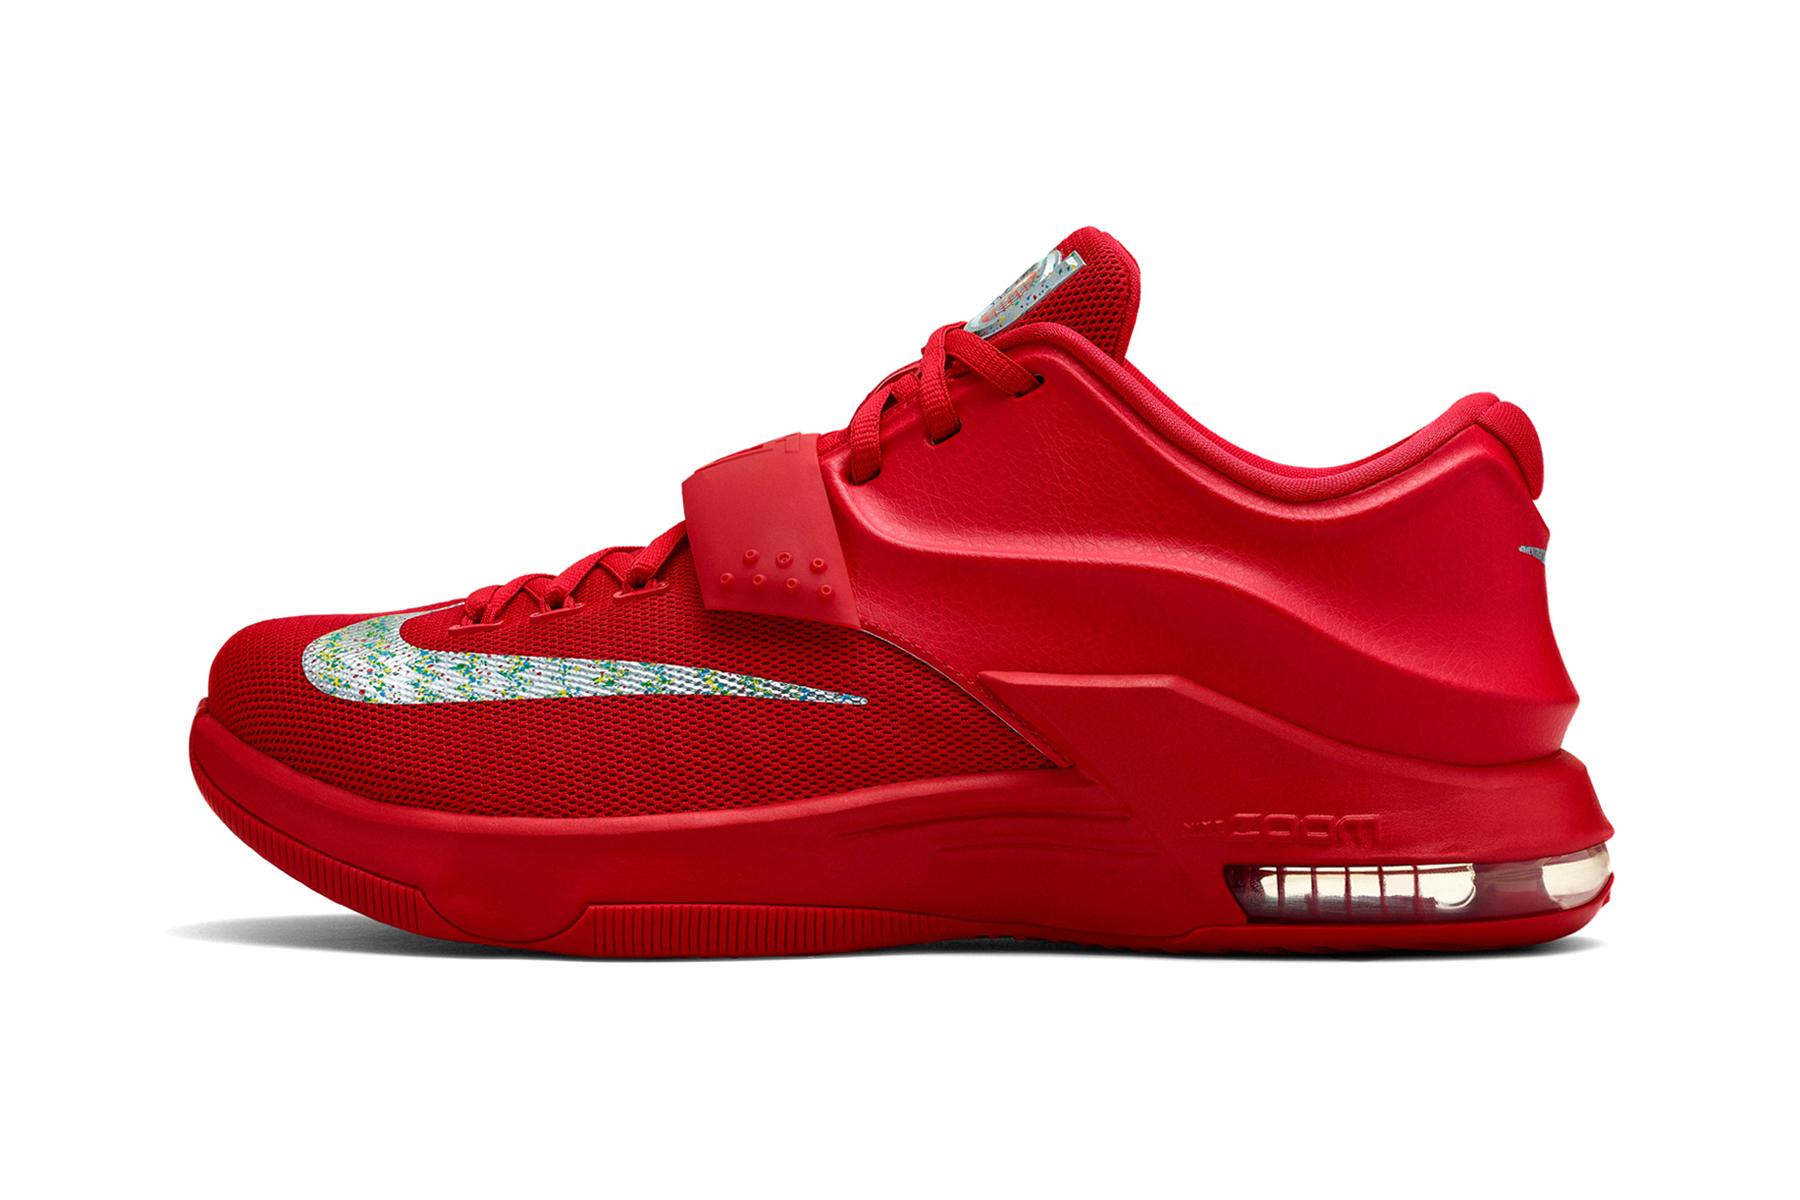 Nike Debuts Several More KD7 Colorways